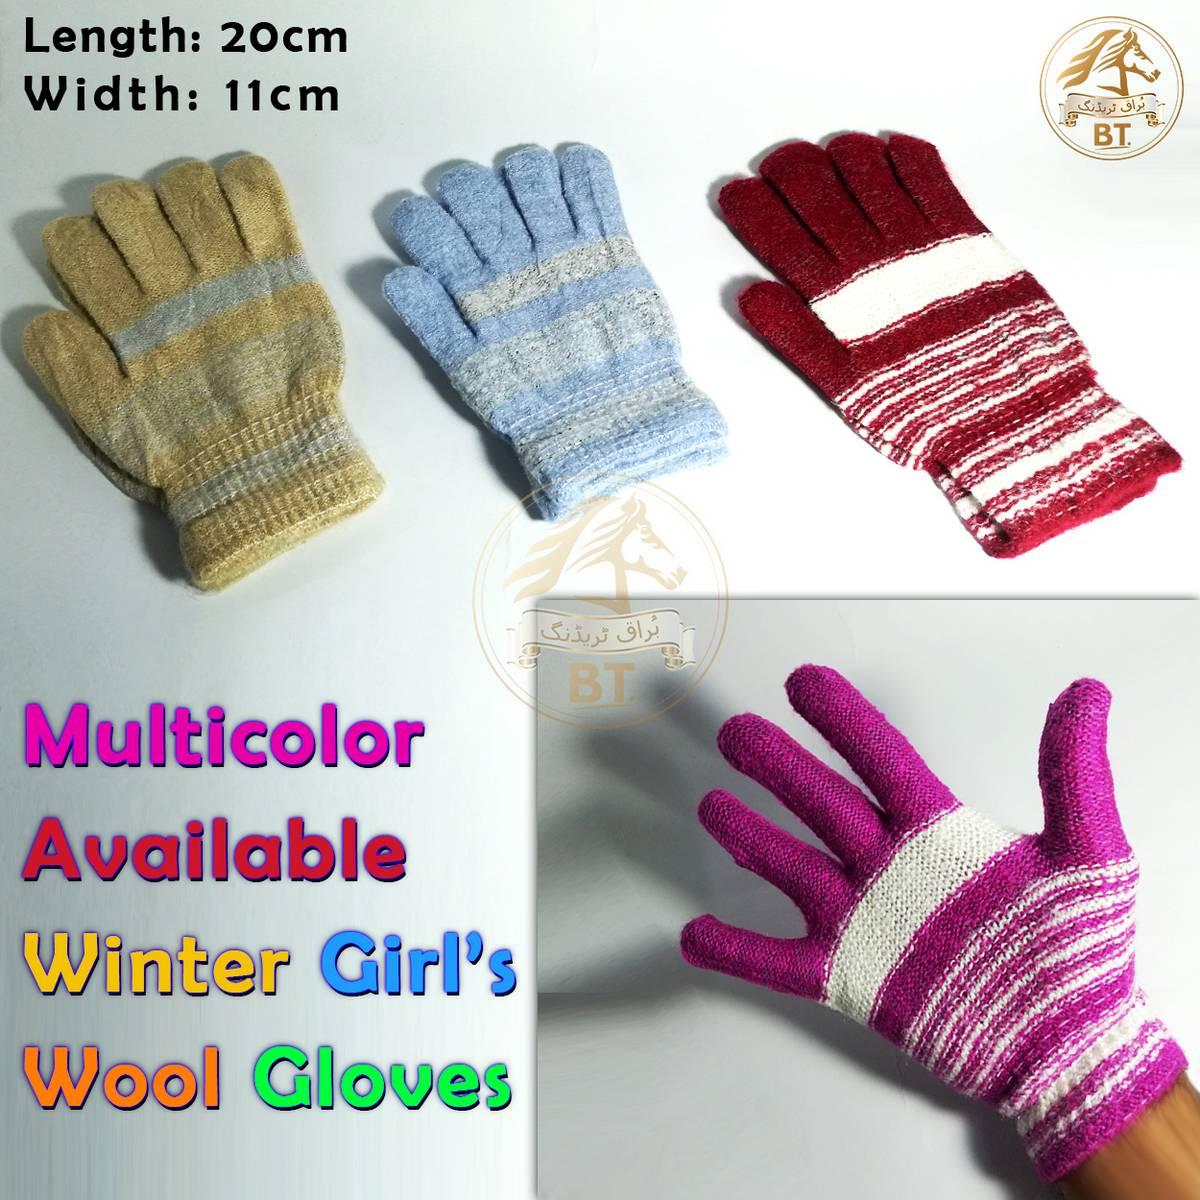 Winter Wool Soft Feel Fully Warm Gloves Hand Warmer Knitted for Girls, Women, Ladies - 20cm, 11cm